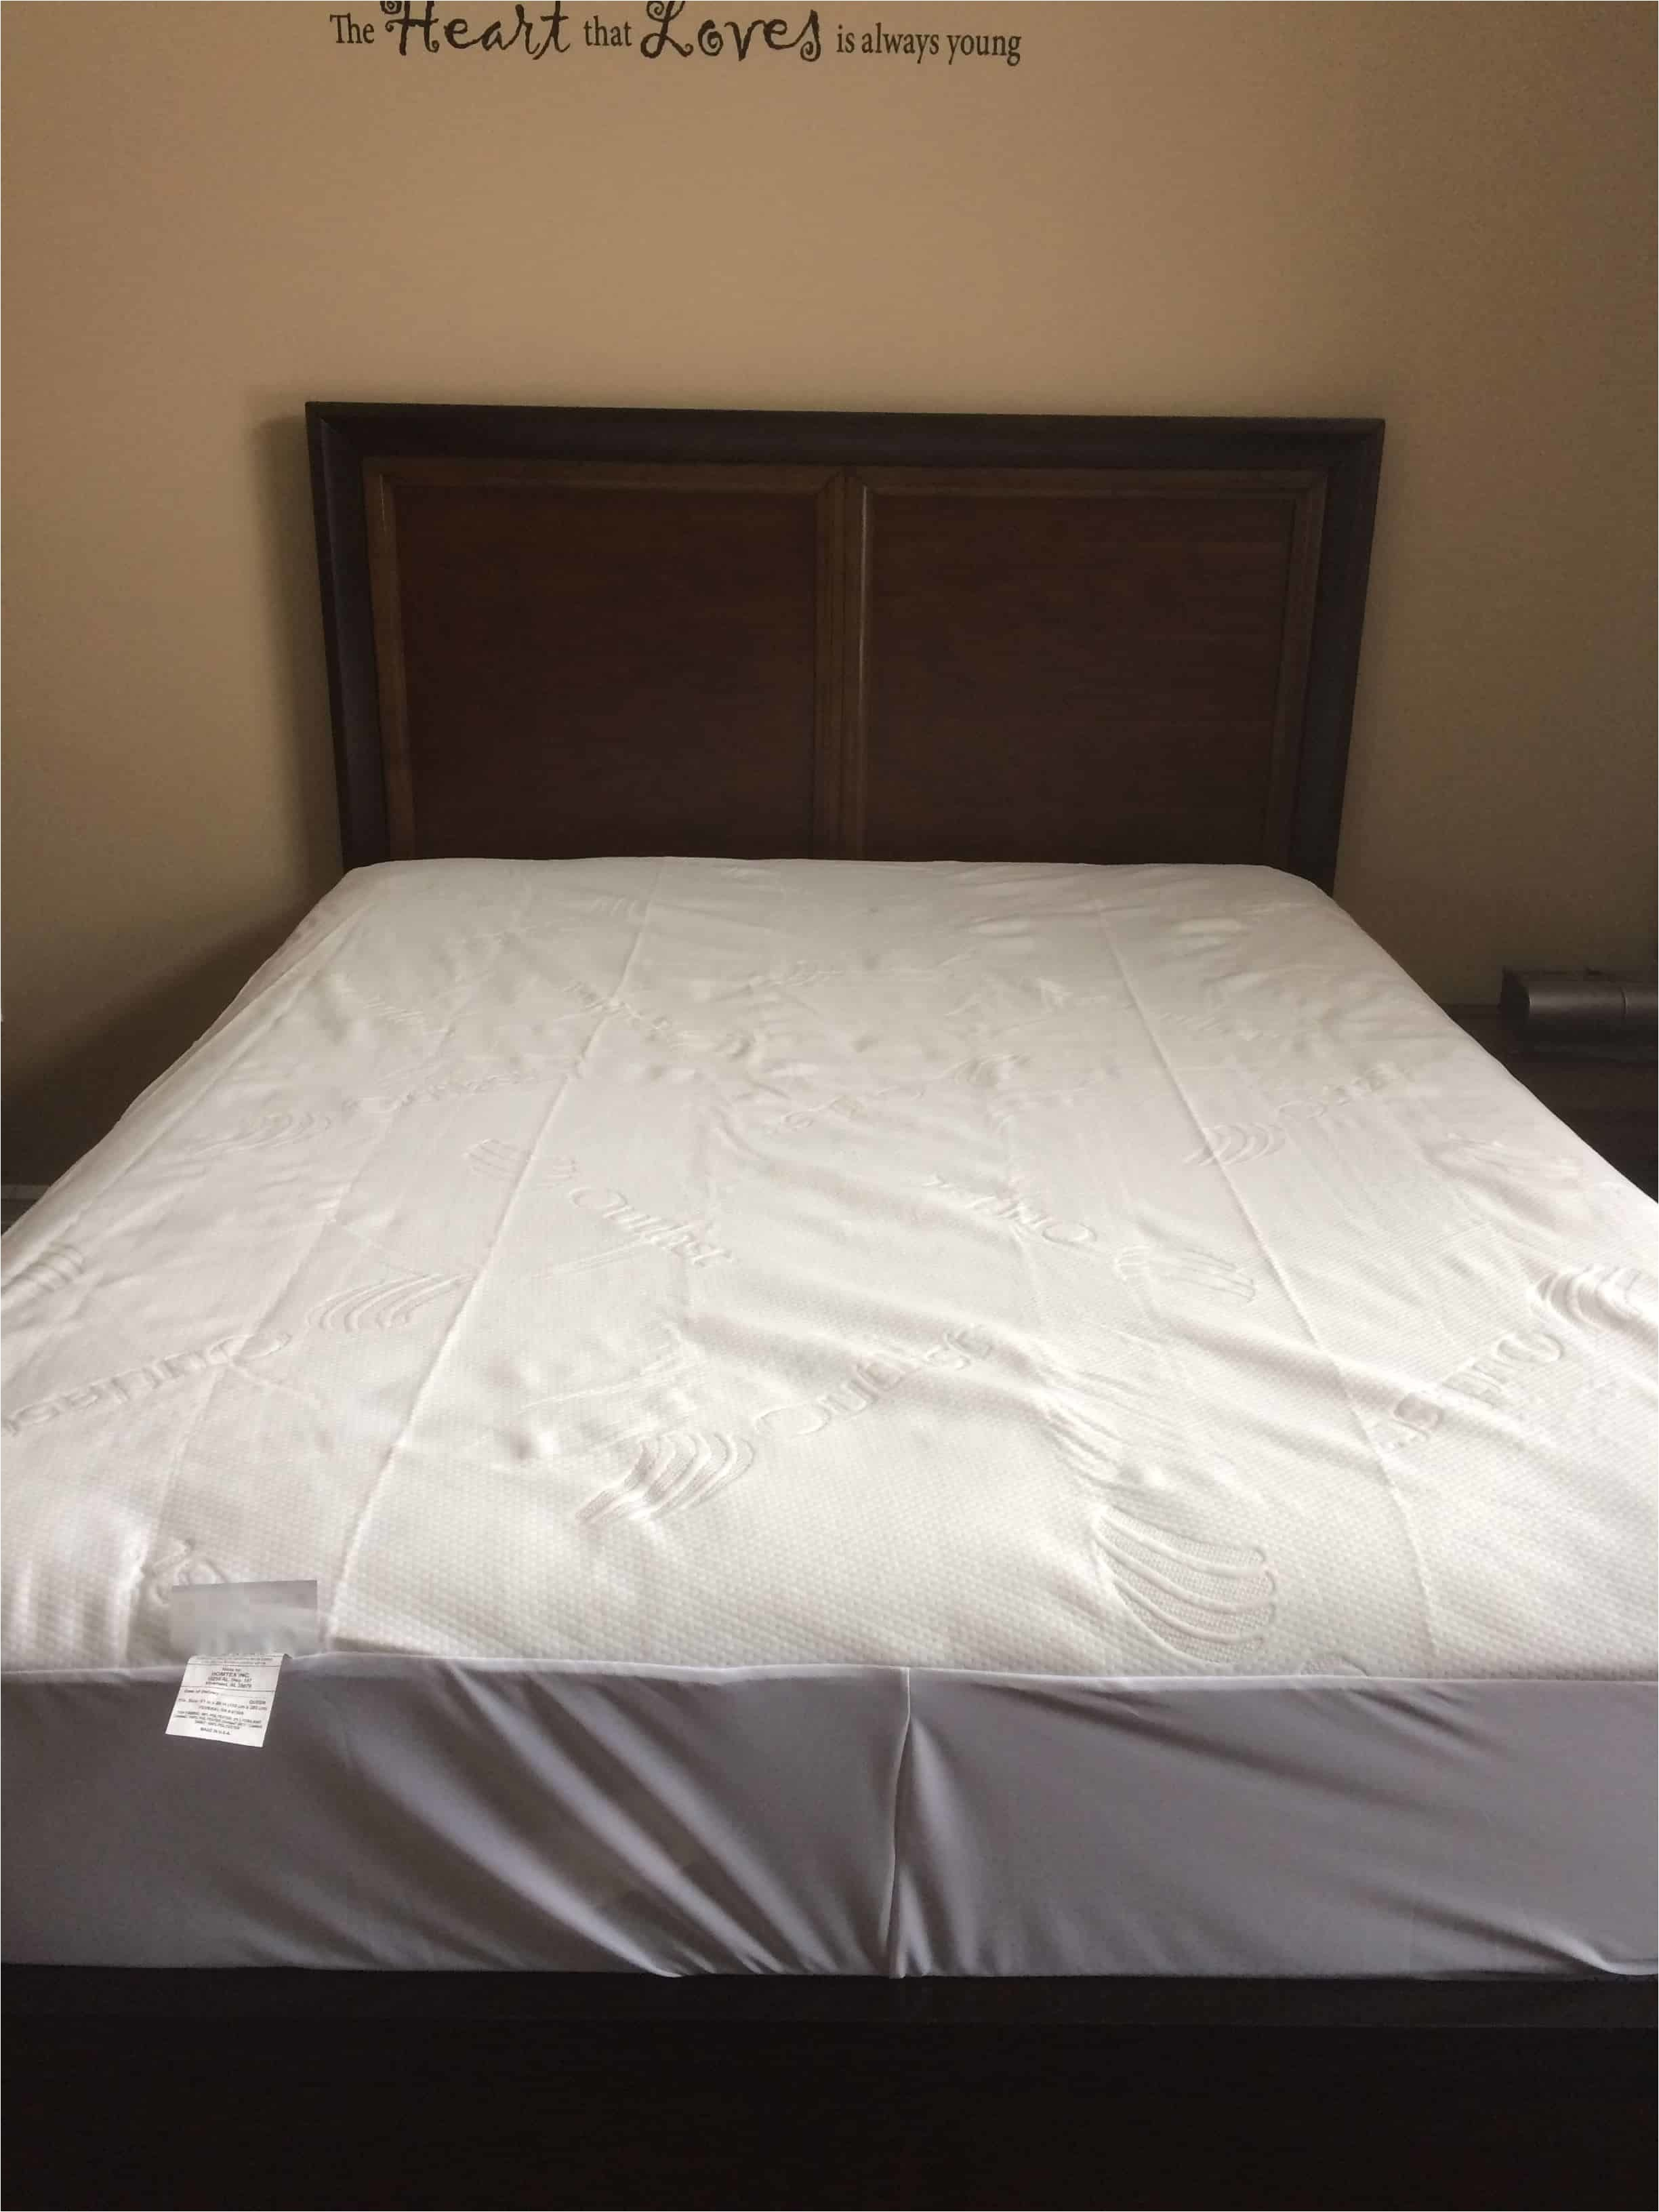 slumbercloud dryline mattress protector review